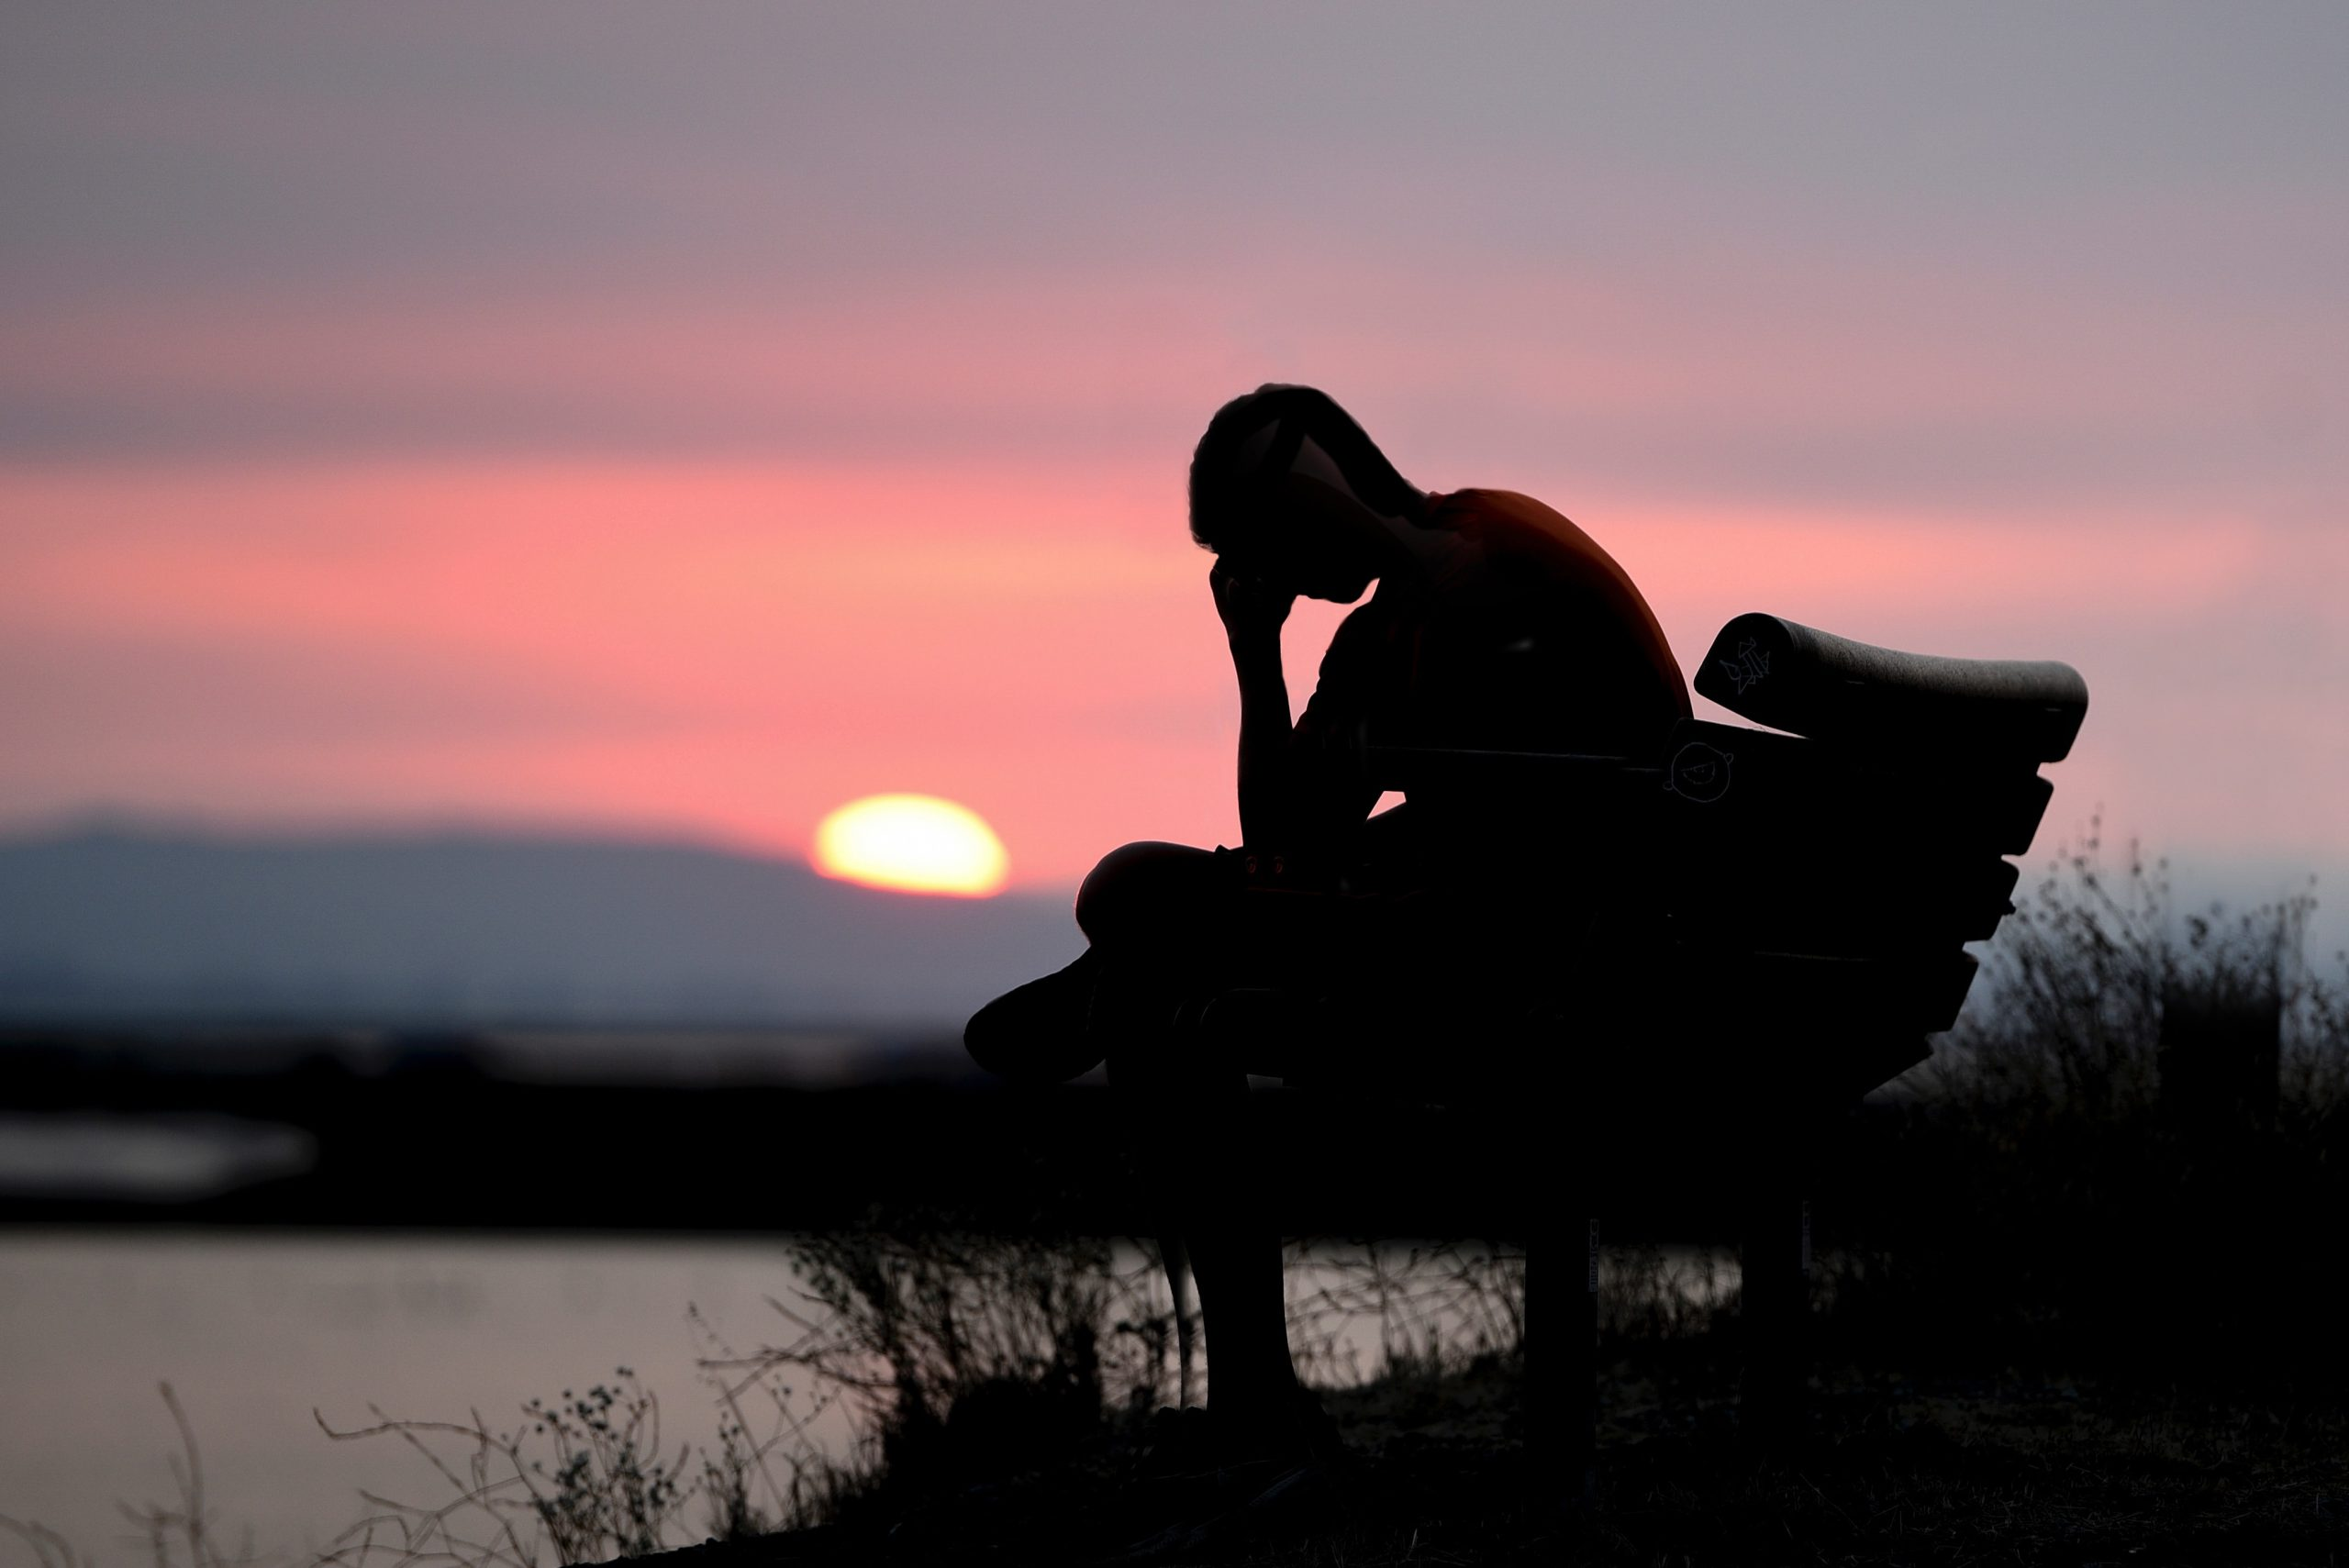 Dealing with Discouragement